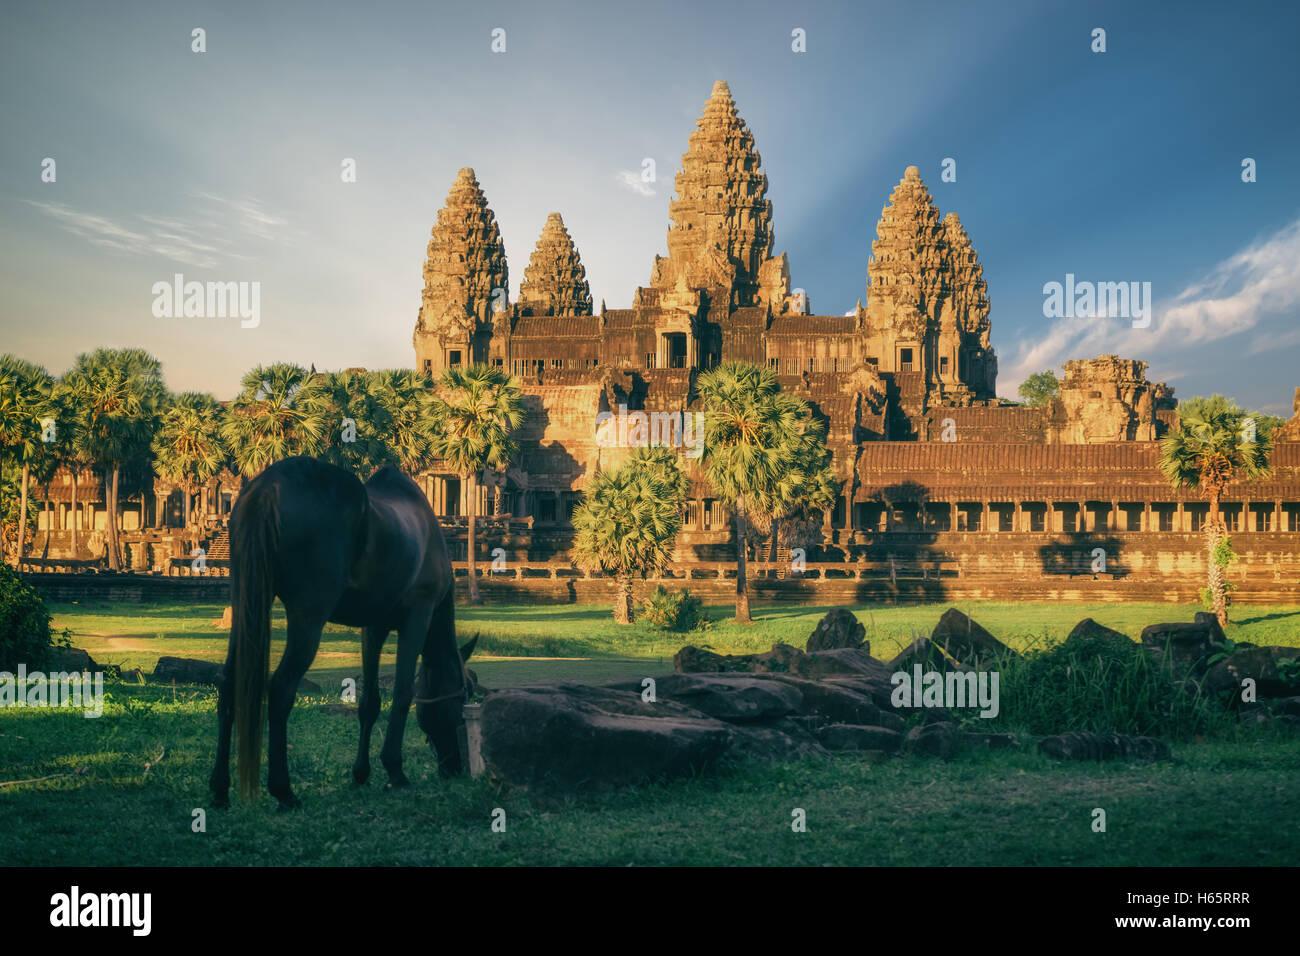 Beautiful view of Angkor Wat Temple, Cambodia, Southeast Asia Stock Photo